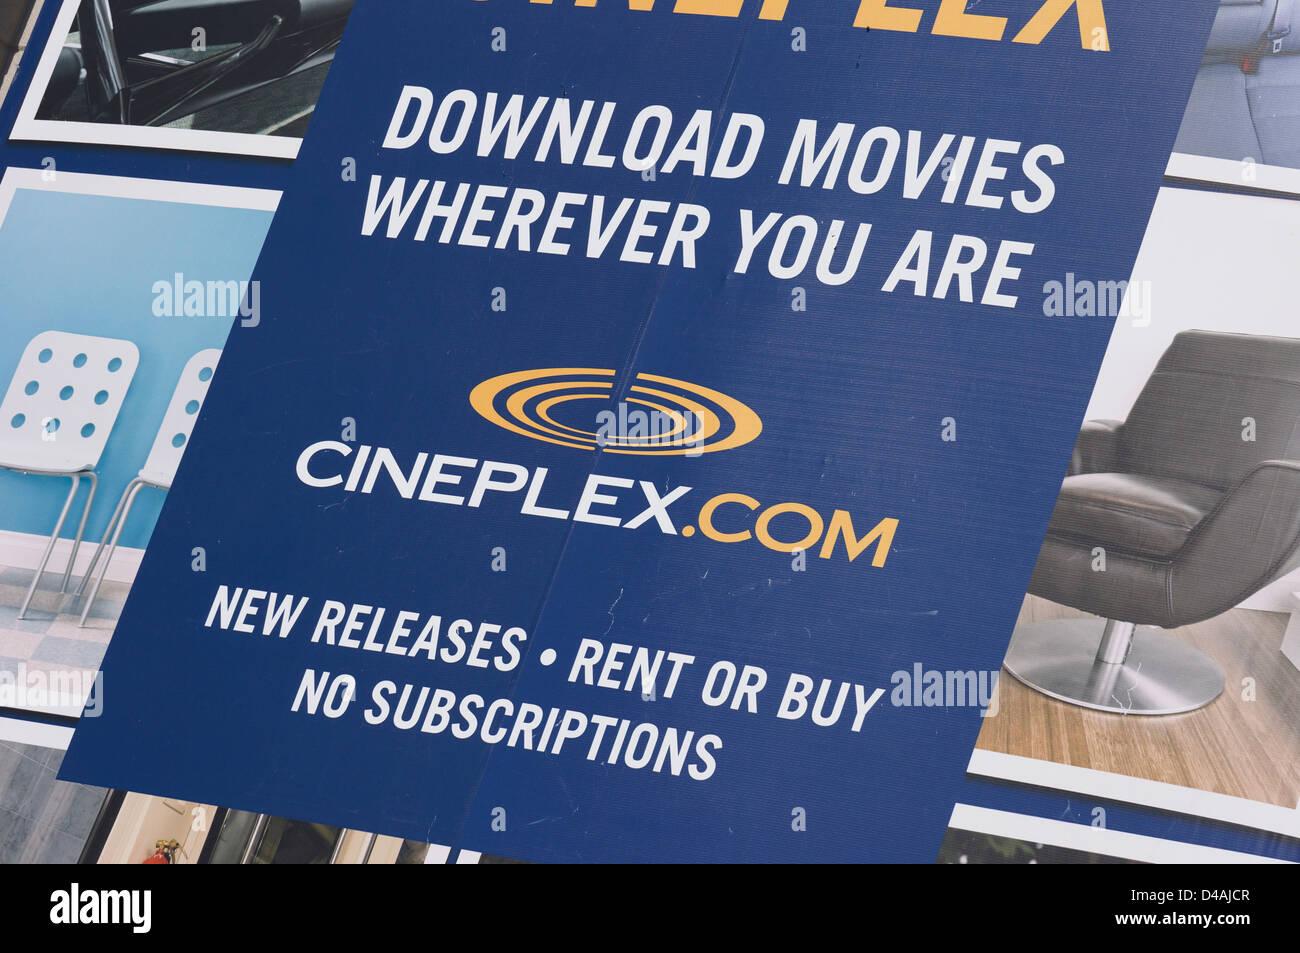 Cineplex Download Filme Ad closeup Stockbild